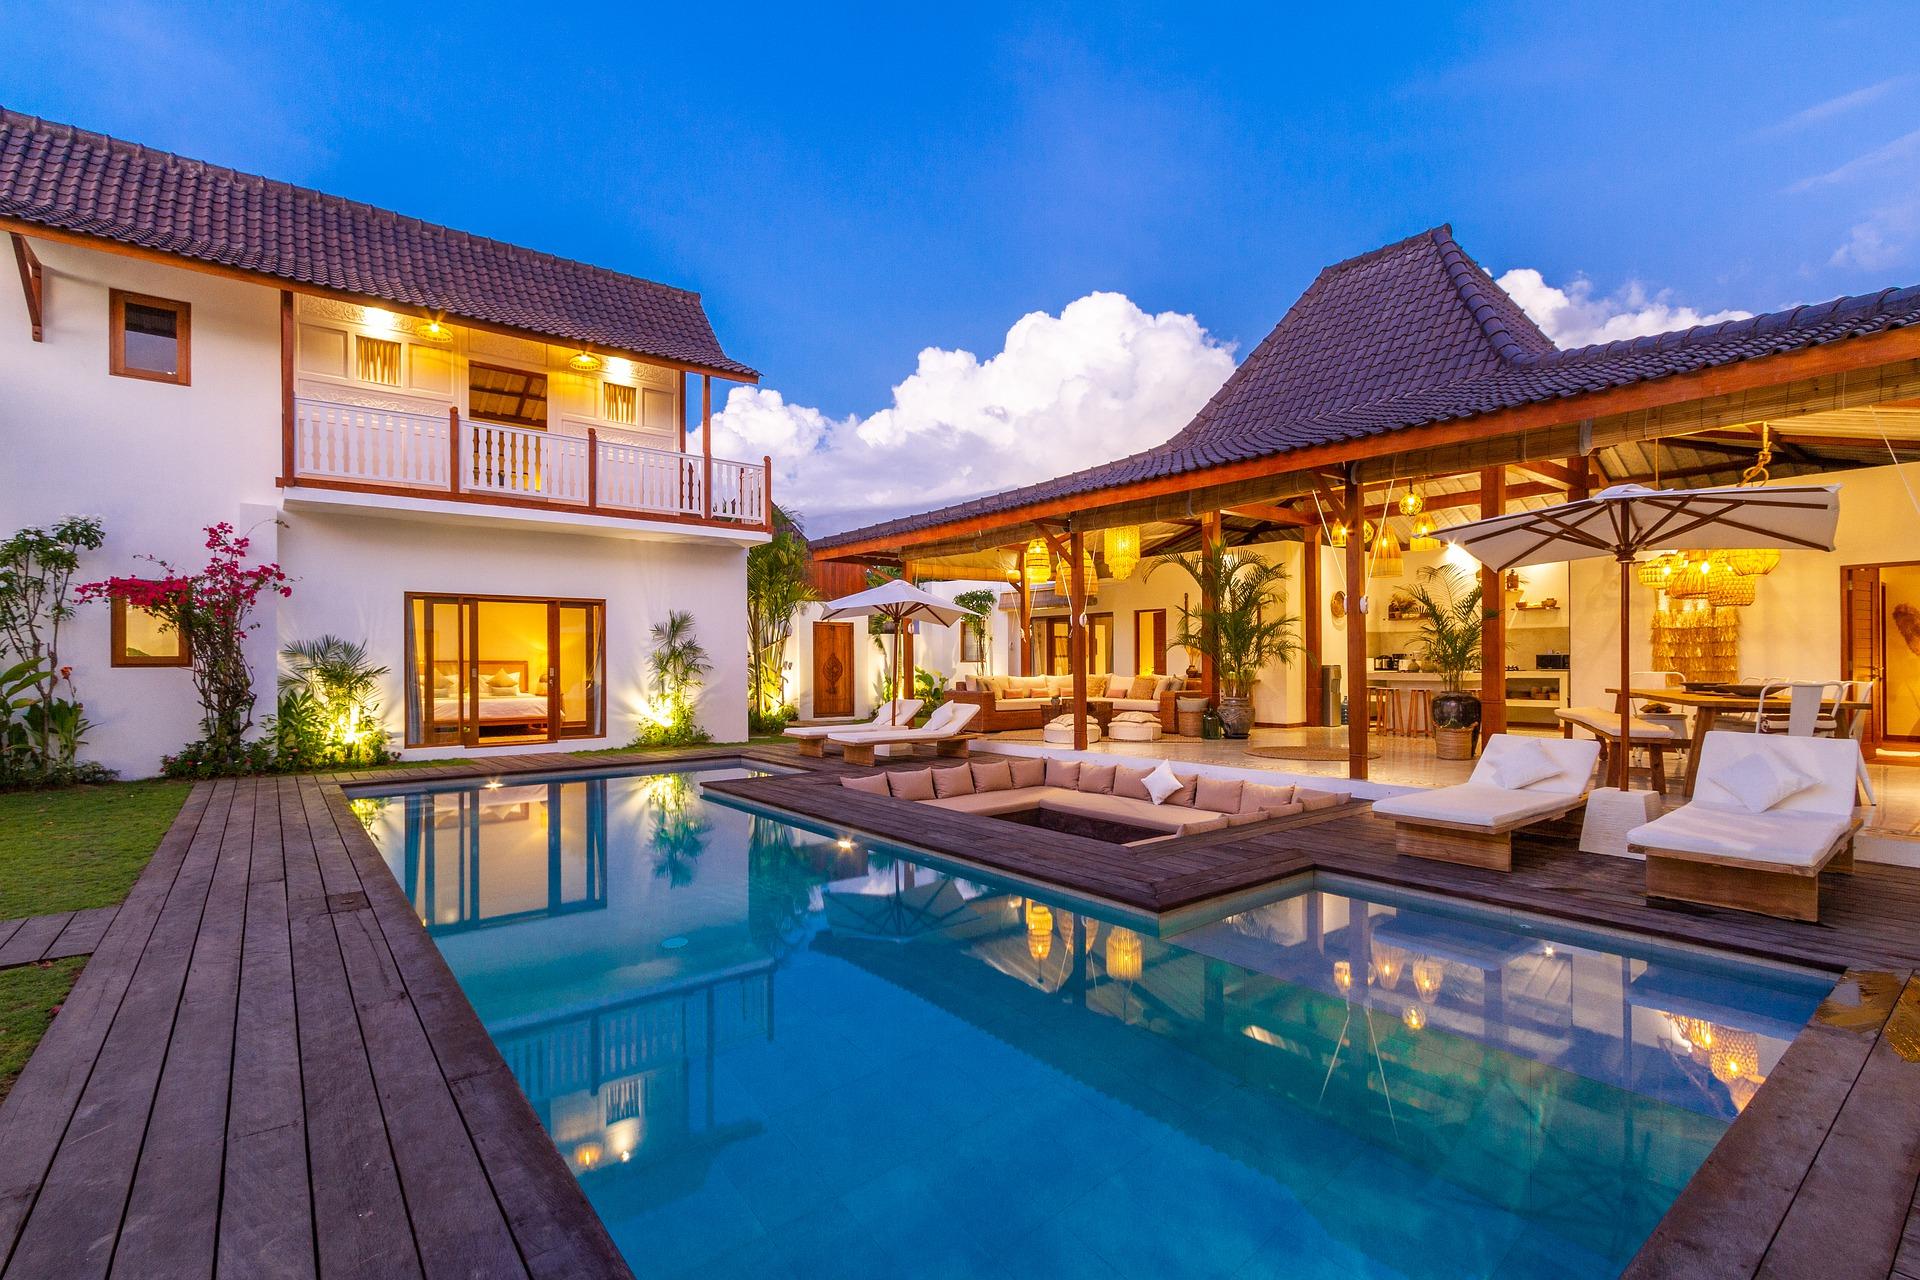 Homes & Villas Luxury Villa